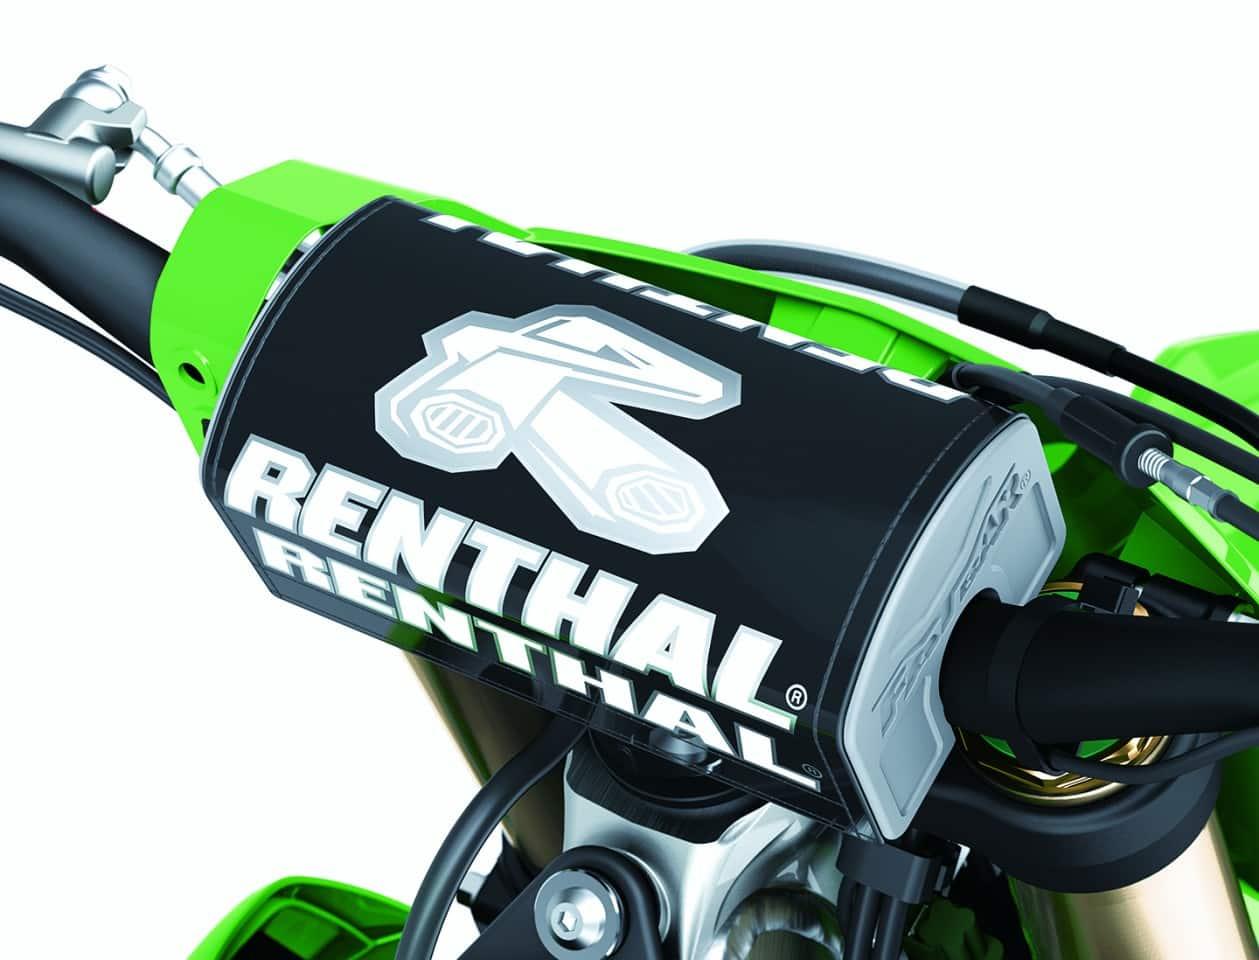 Der Renthal-Fatbar-Lenker gehört ebenso zu den Neuerungen für 2021